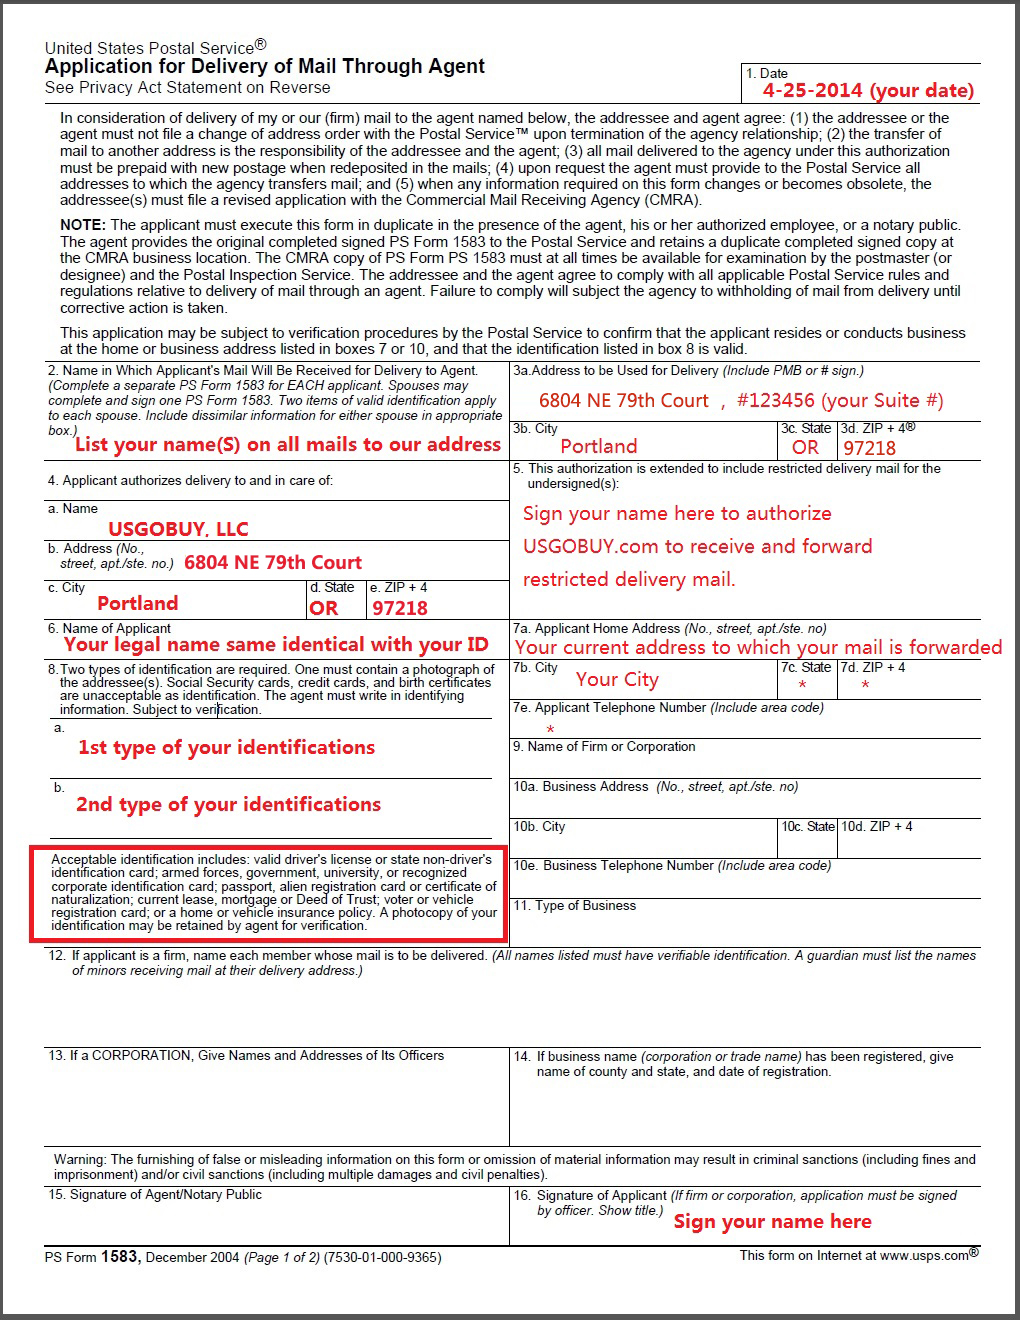 FAQ | USGoBuy International Forwarding Service in US